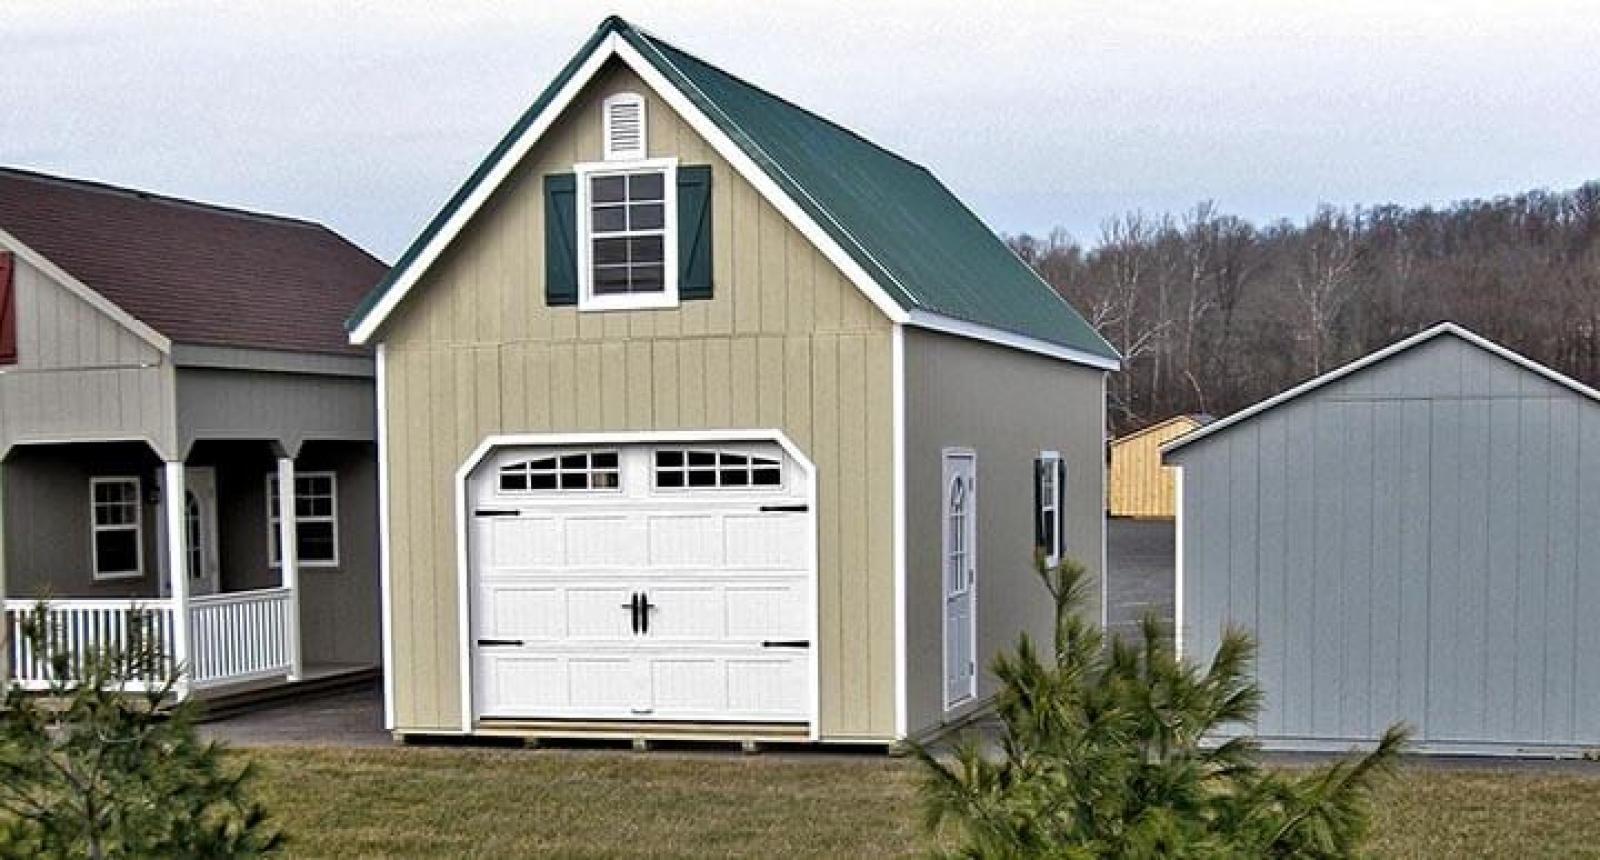 A 2 story prefab garage takes a few days of onsite labor